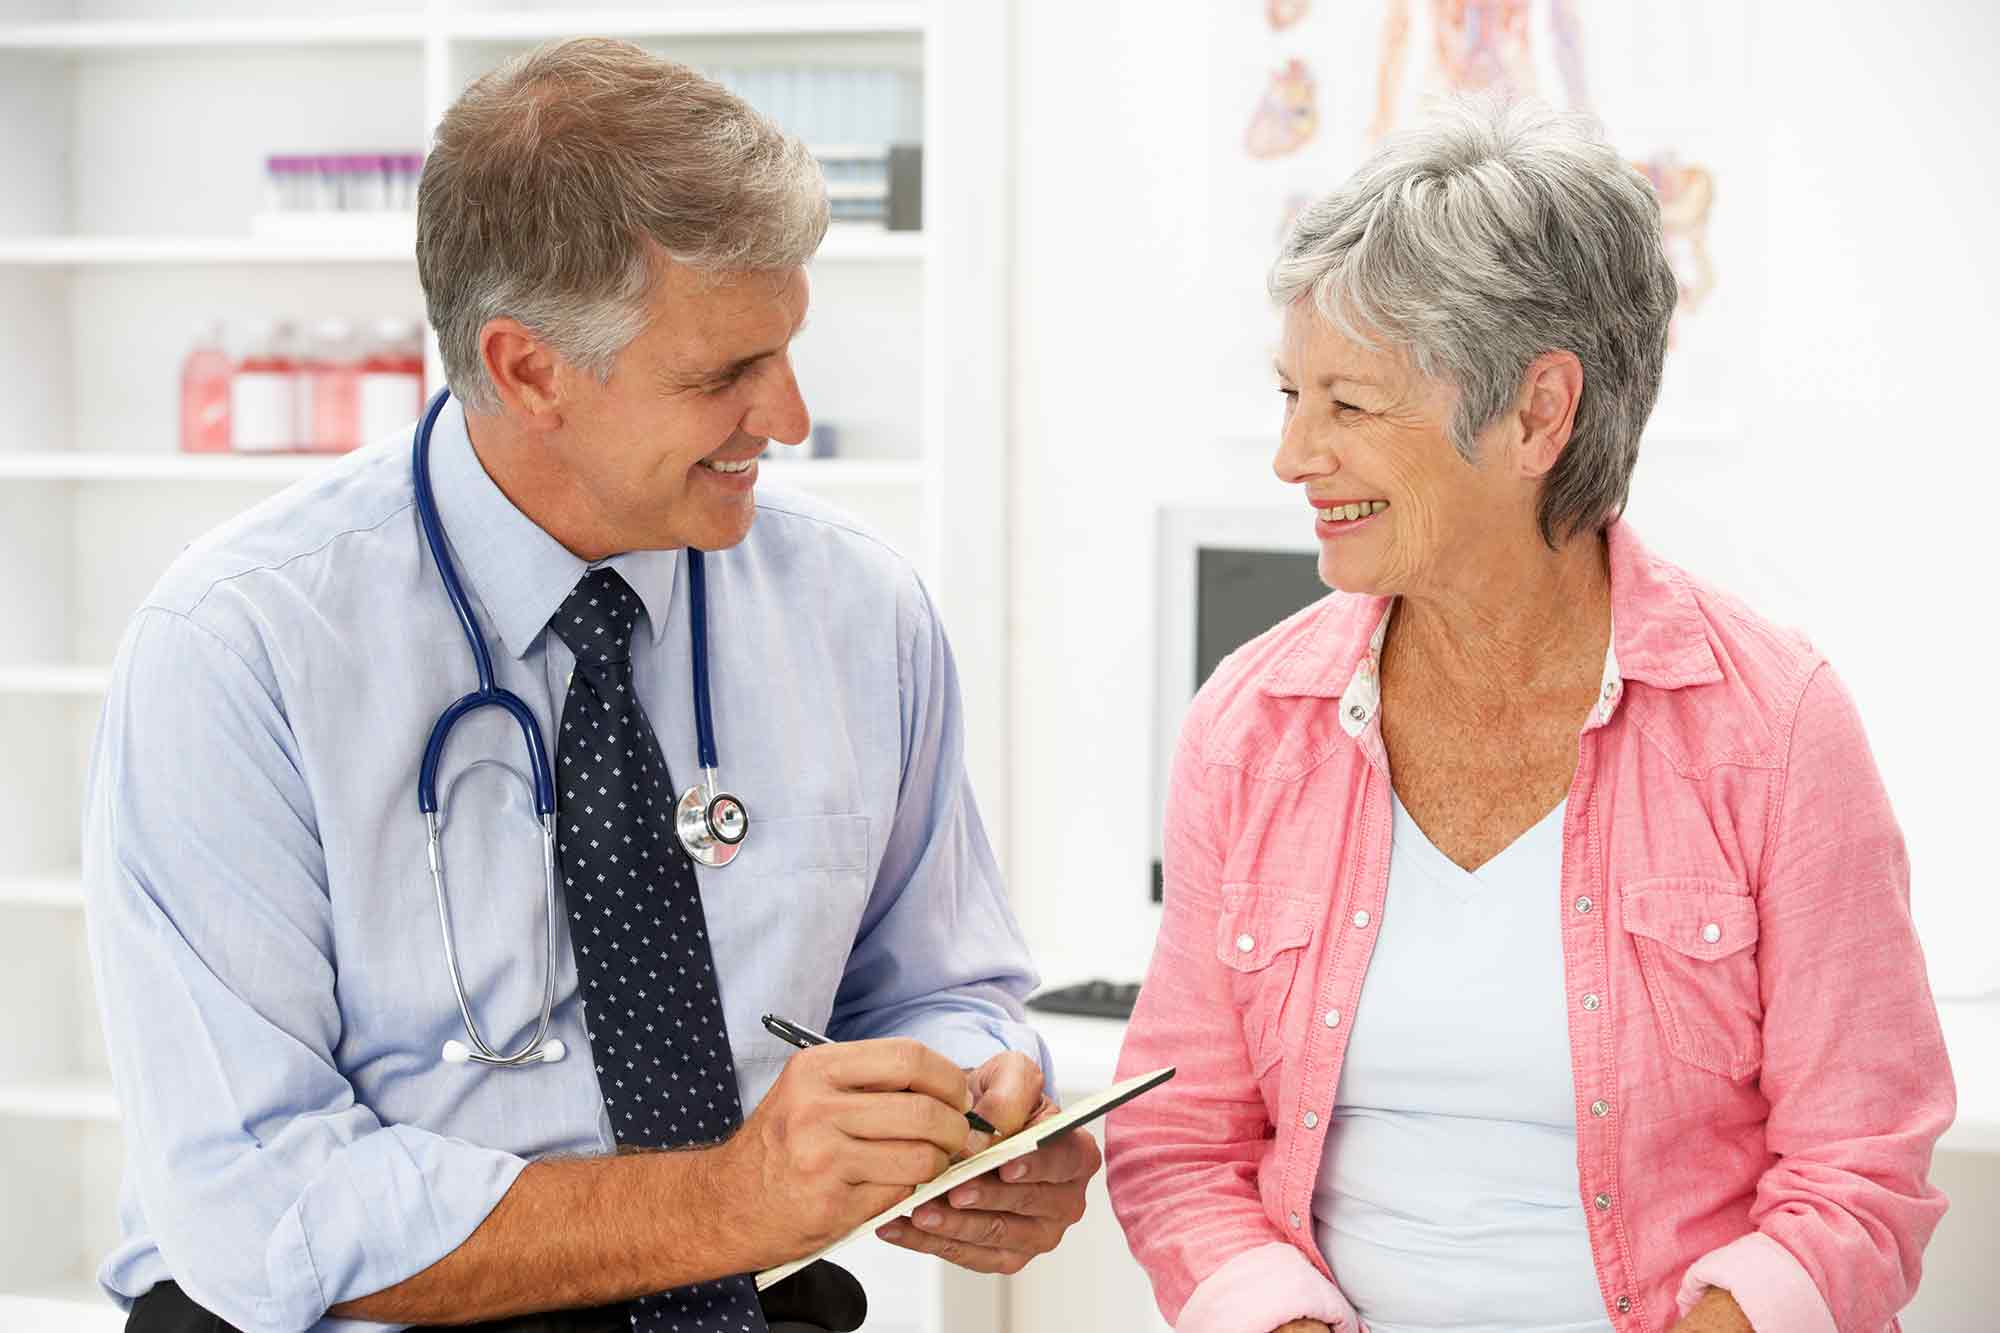 importancia-acolher-paciente-Fonoaudiologia